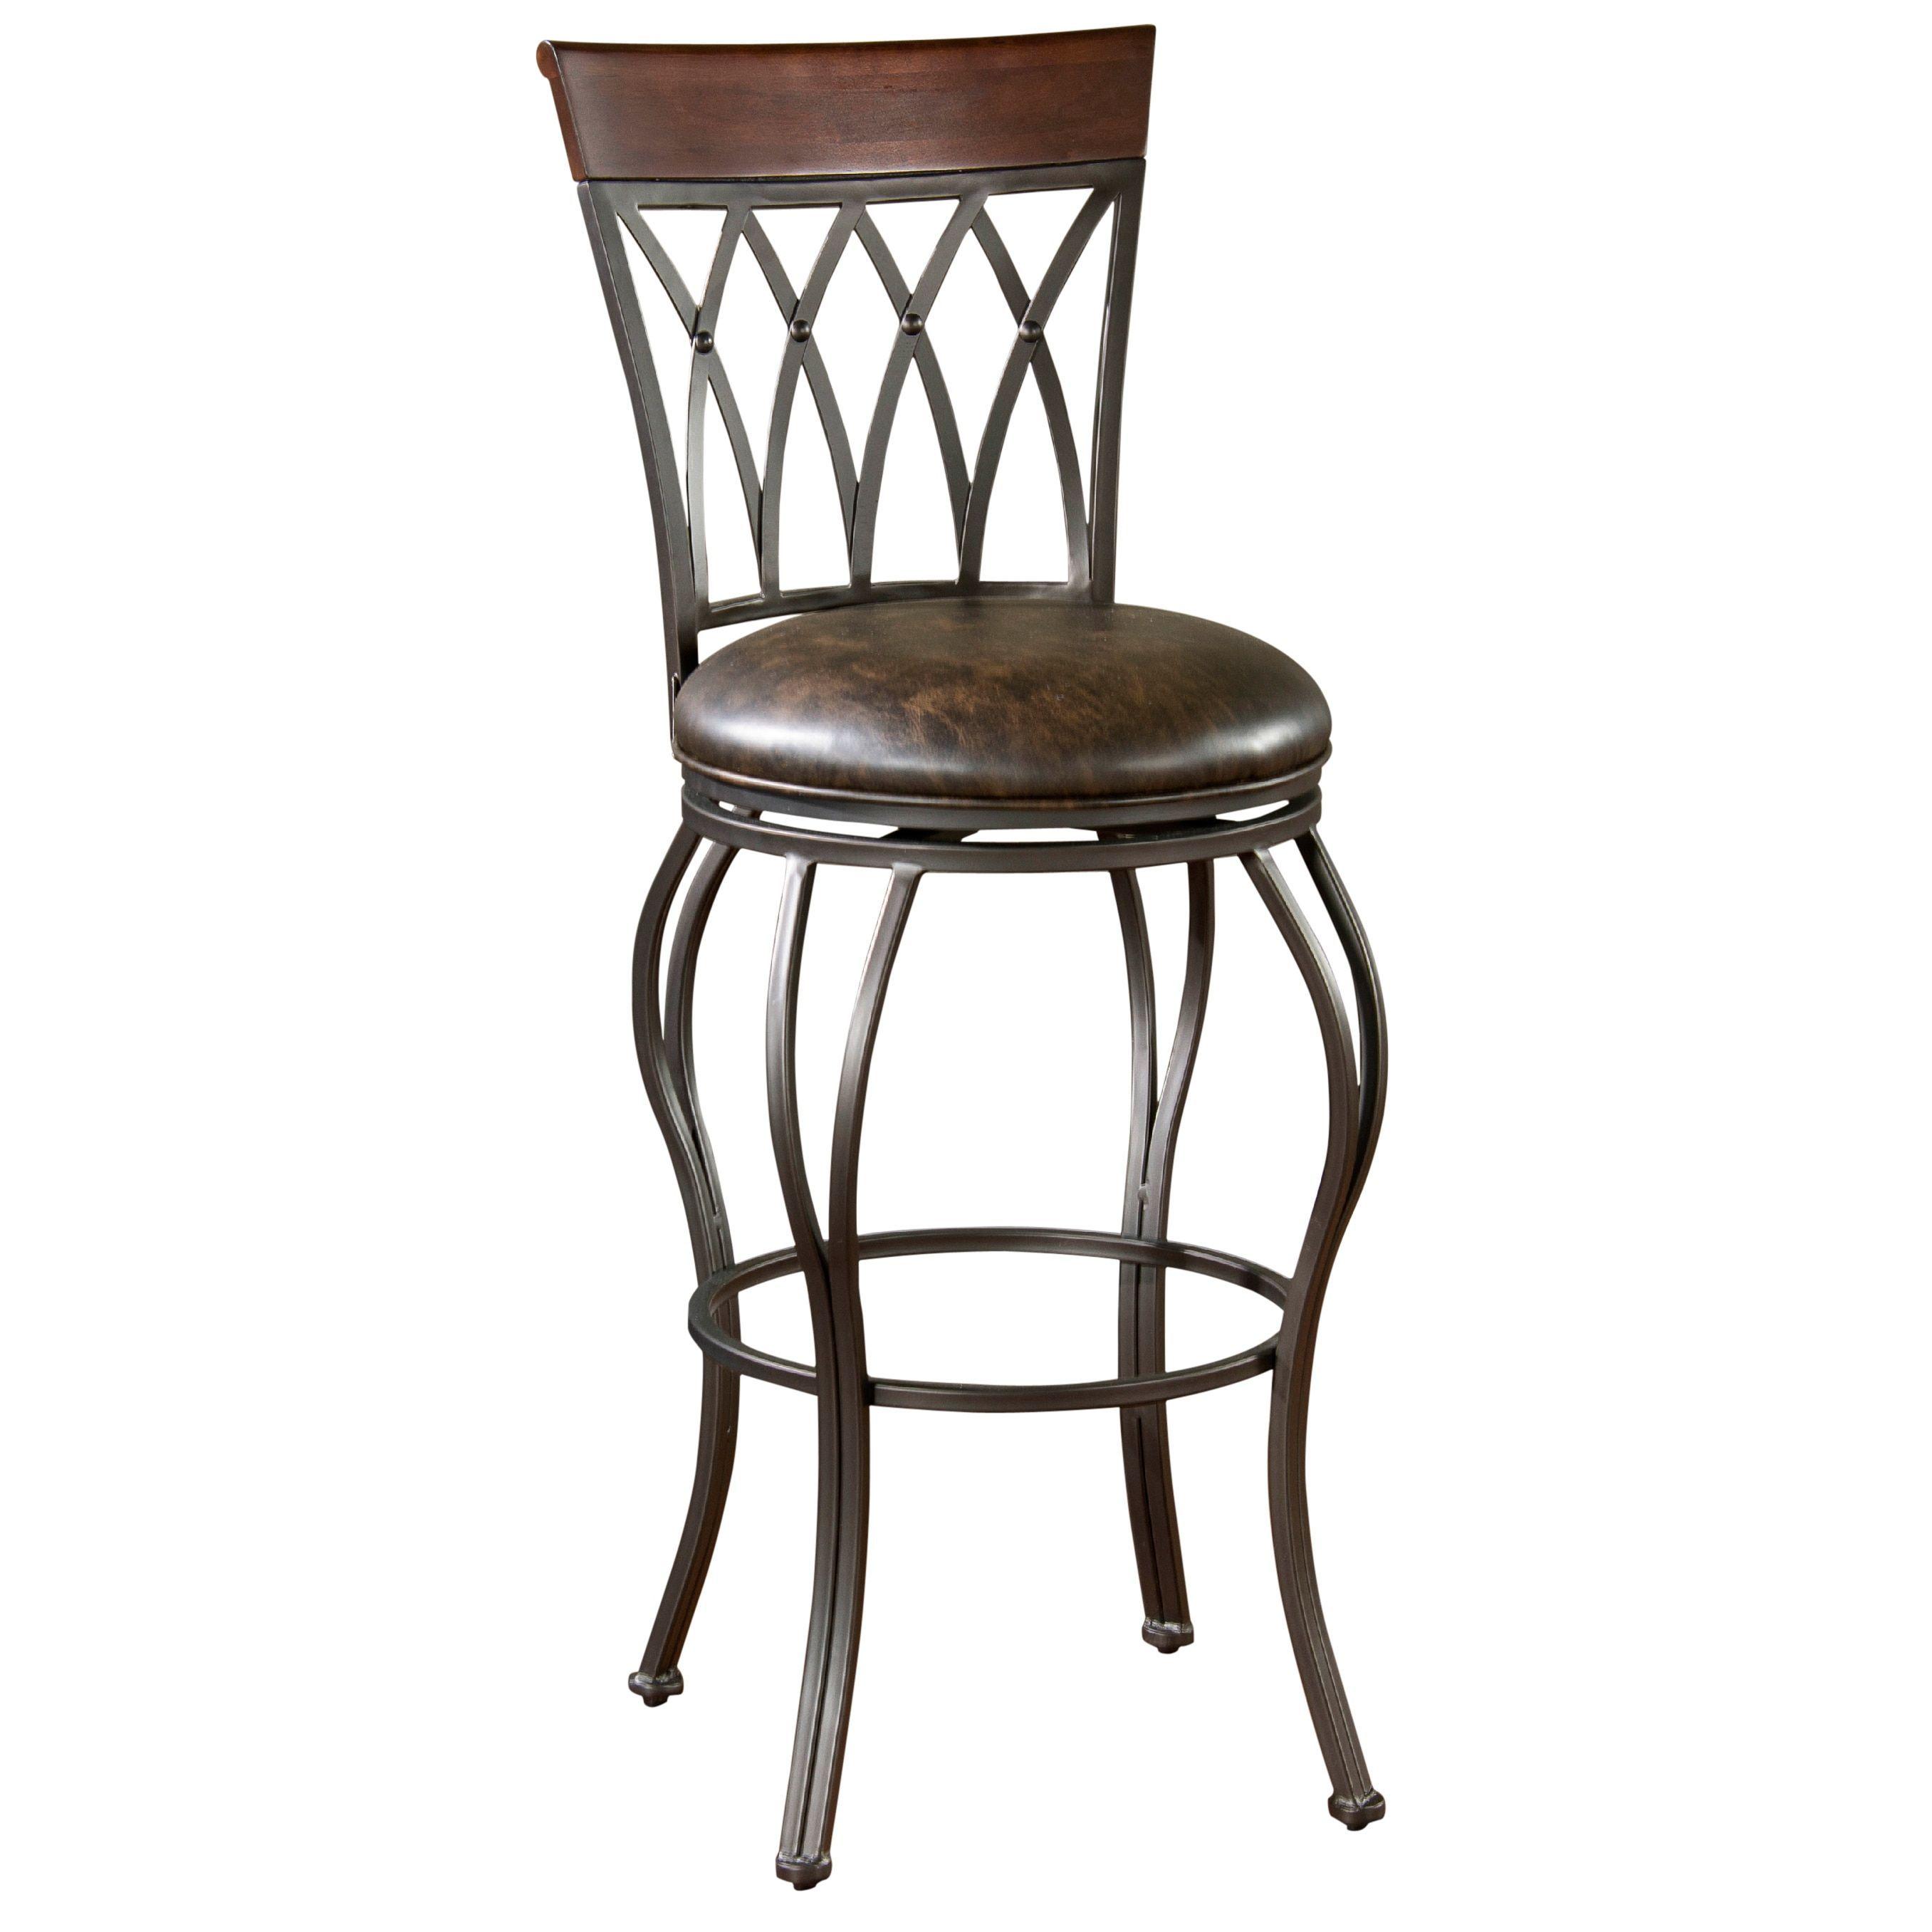 Excellent Parmele 34 Inch Tall Swivel Bar Stool Tall Bar Stool Red Machost Co Dining Chair Design Ideas Machostcouk